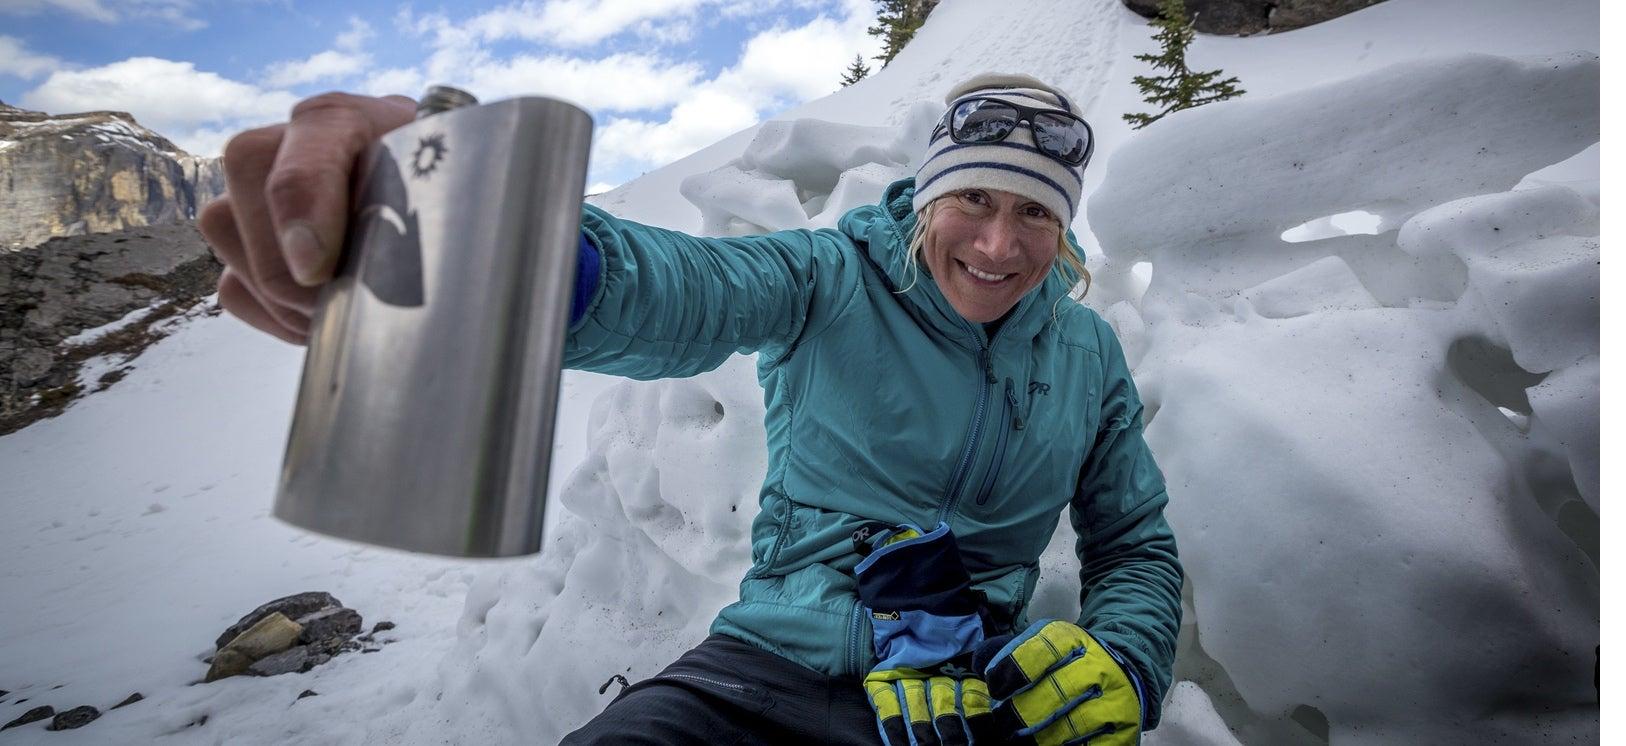 Prep For Ice Climbing Season Like An Alpinist